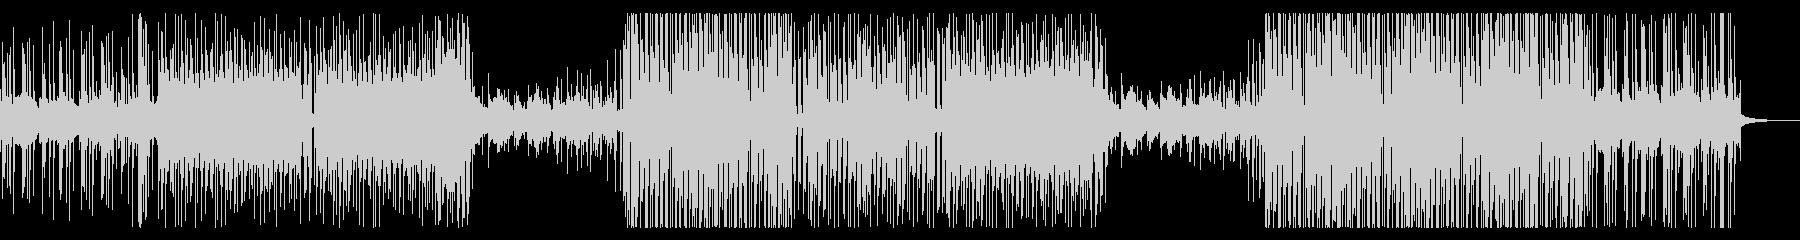 Varaderoの未再生の波形